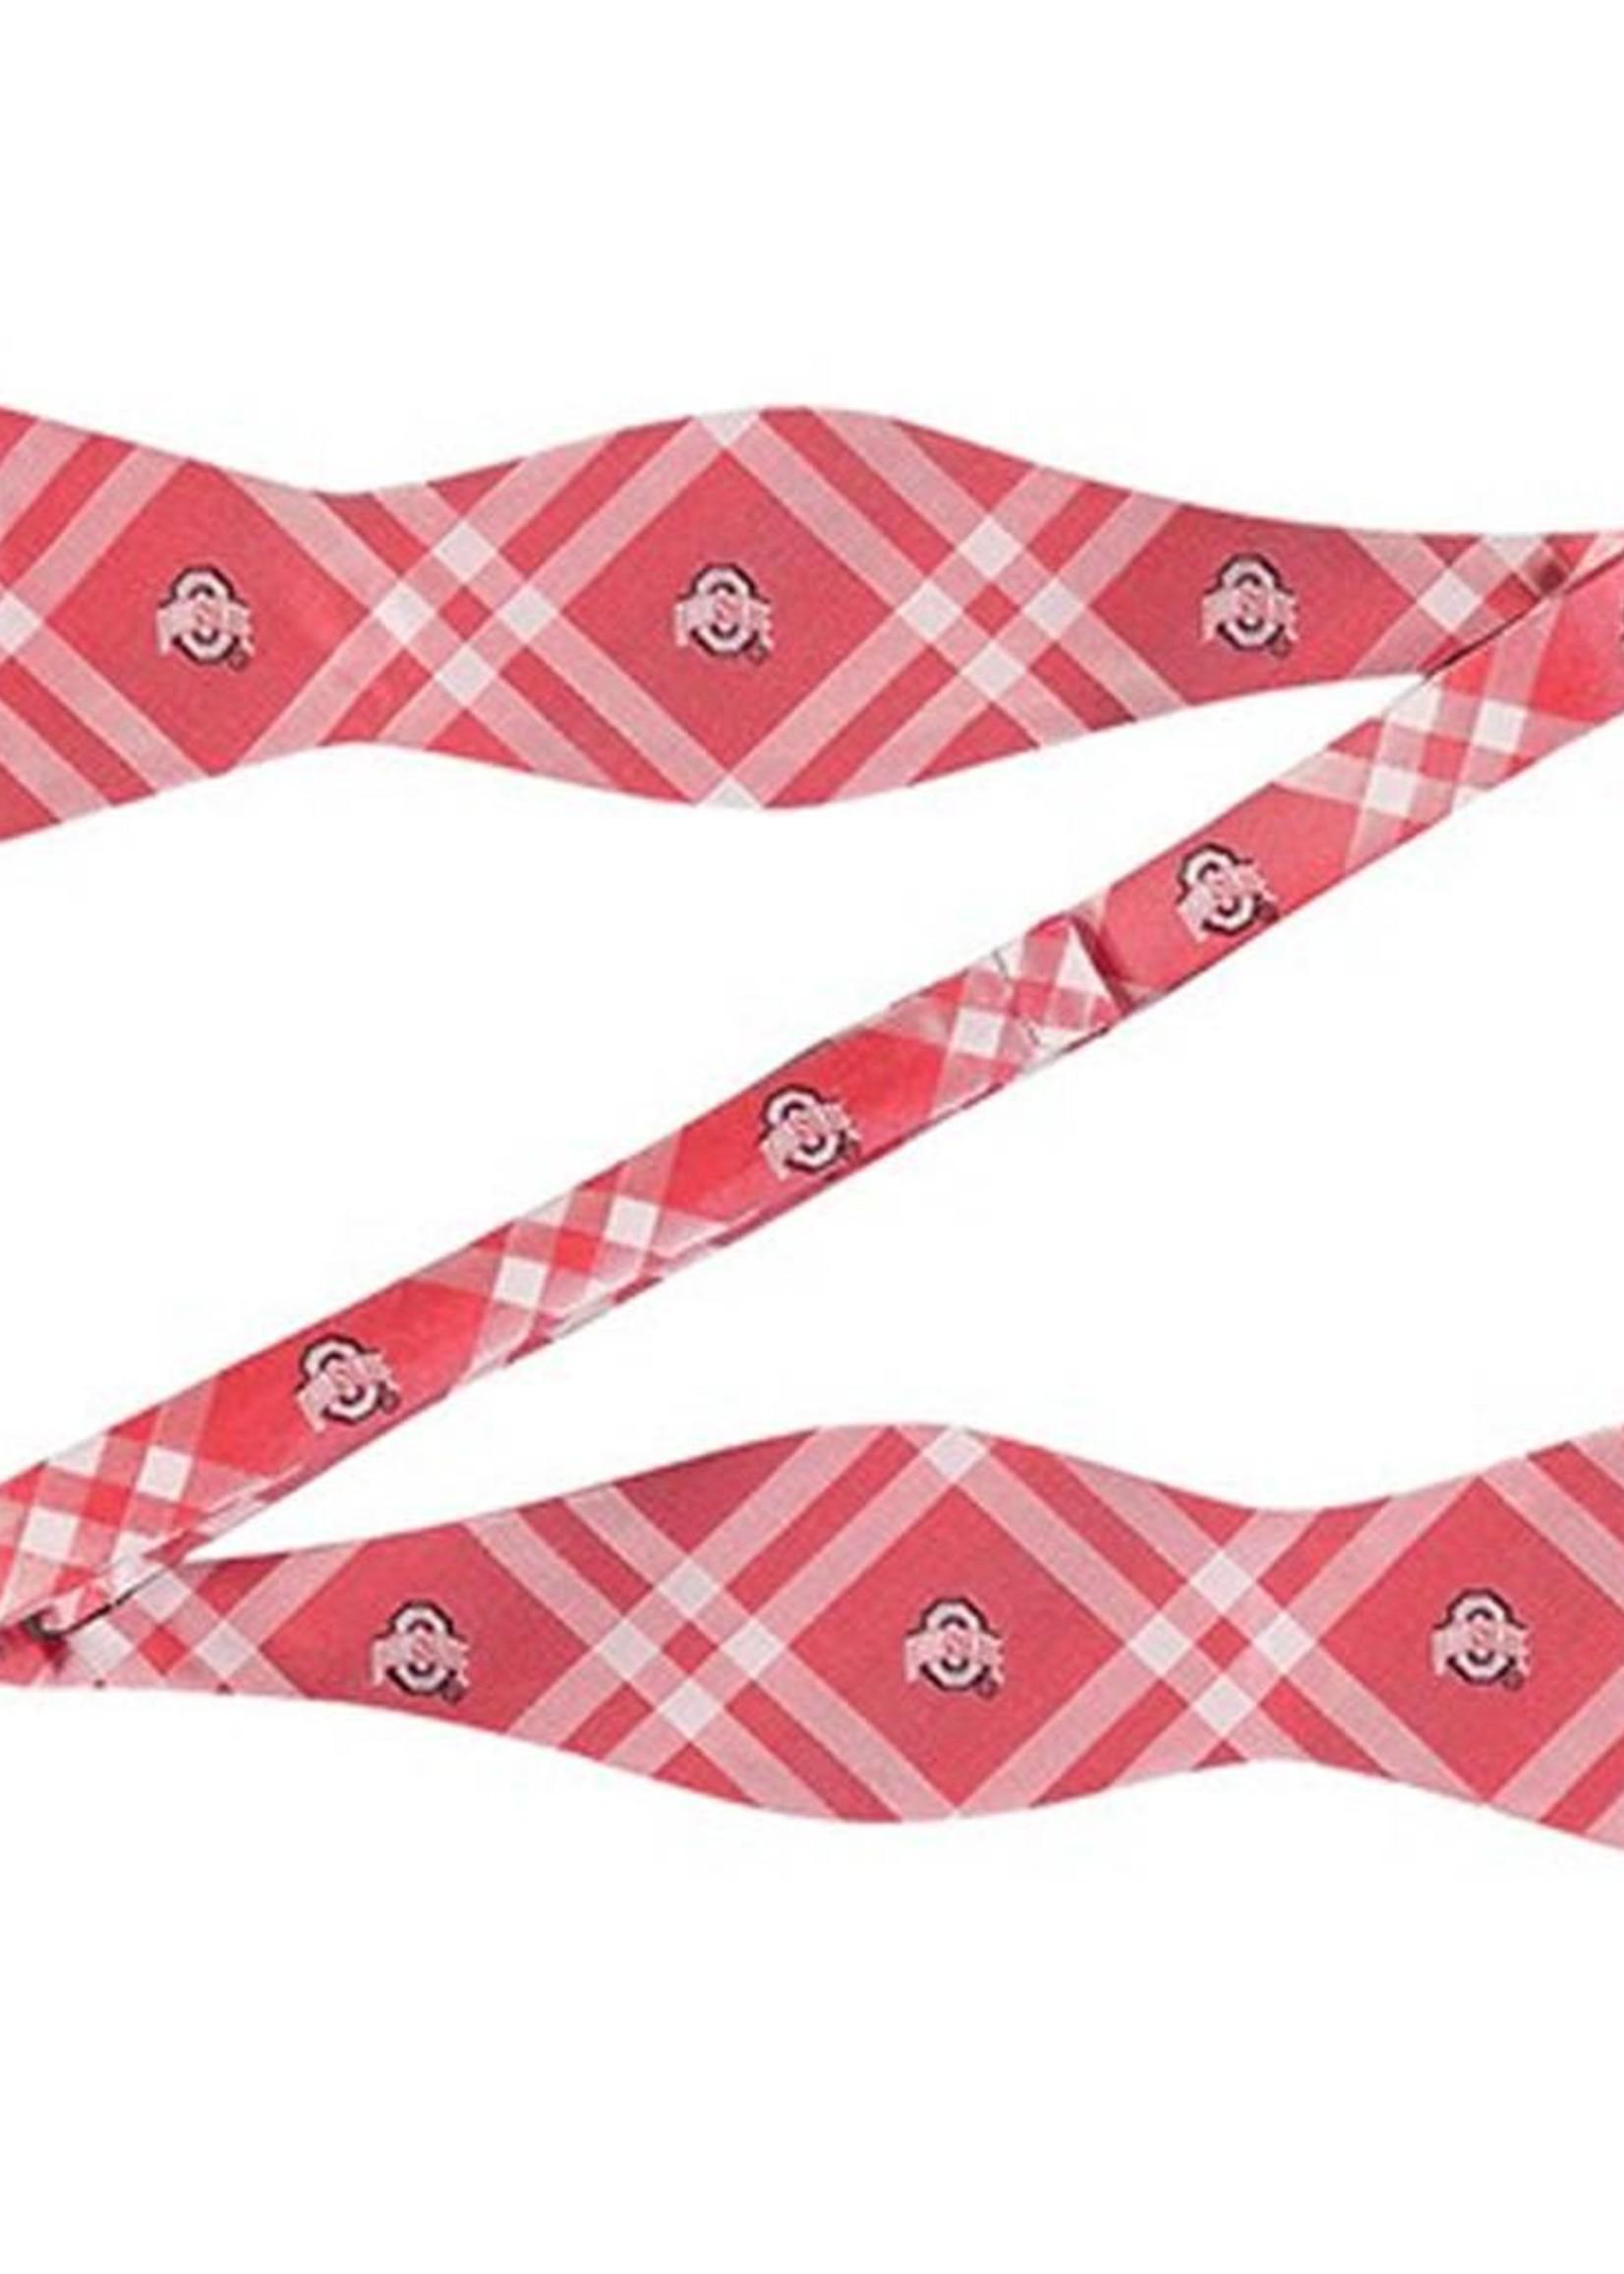 Ohio State University Self Tie Rhodes Bow Tie